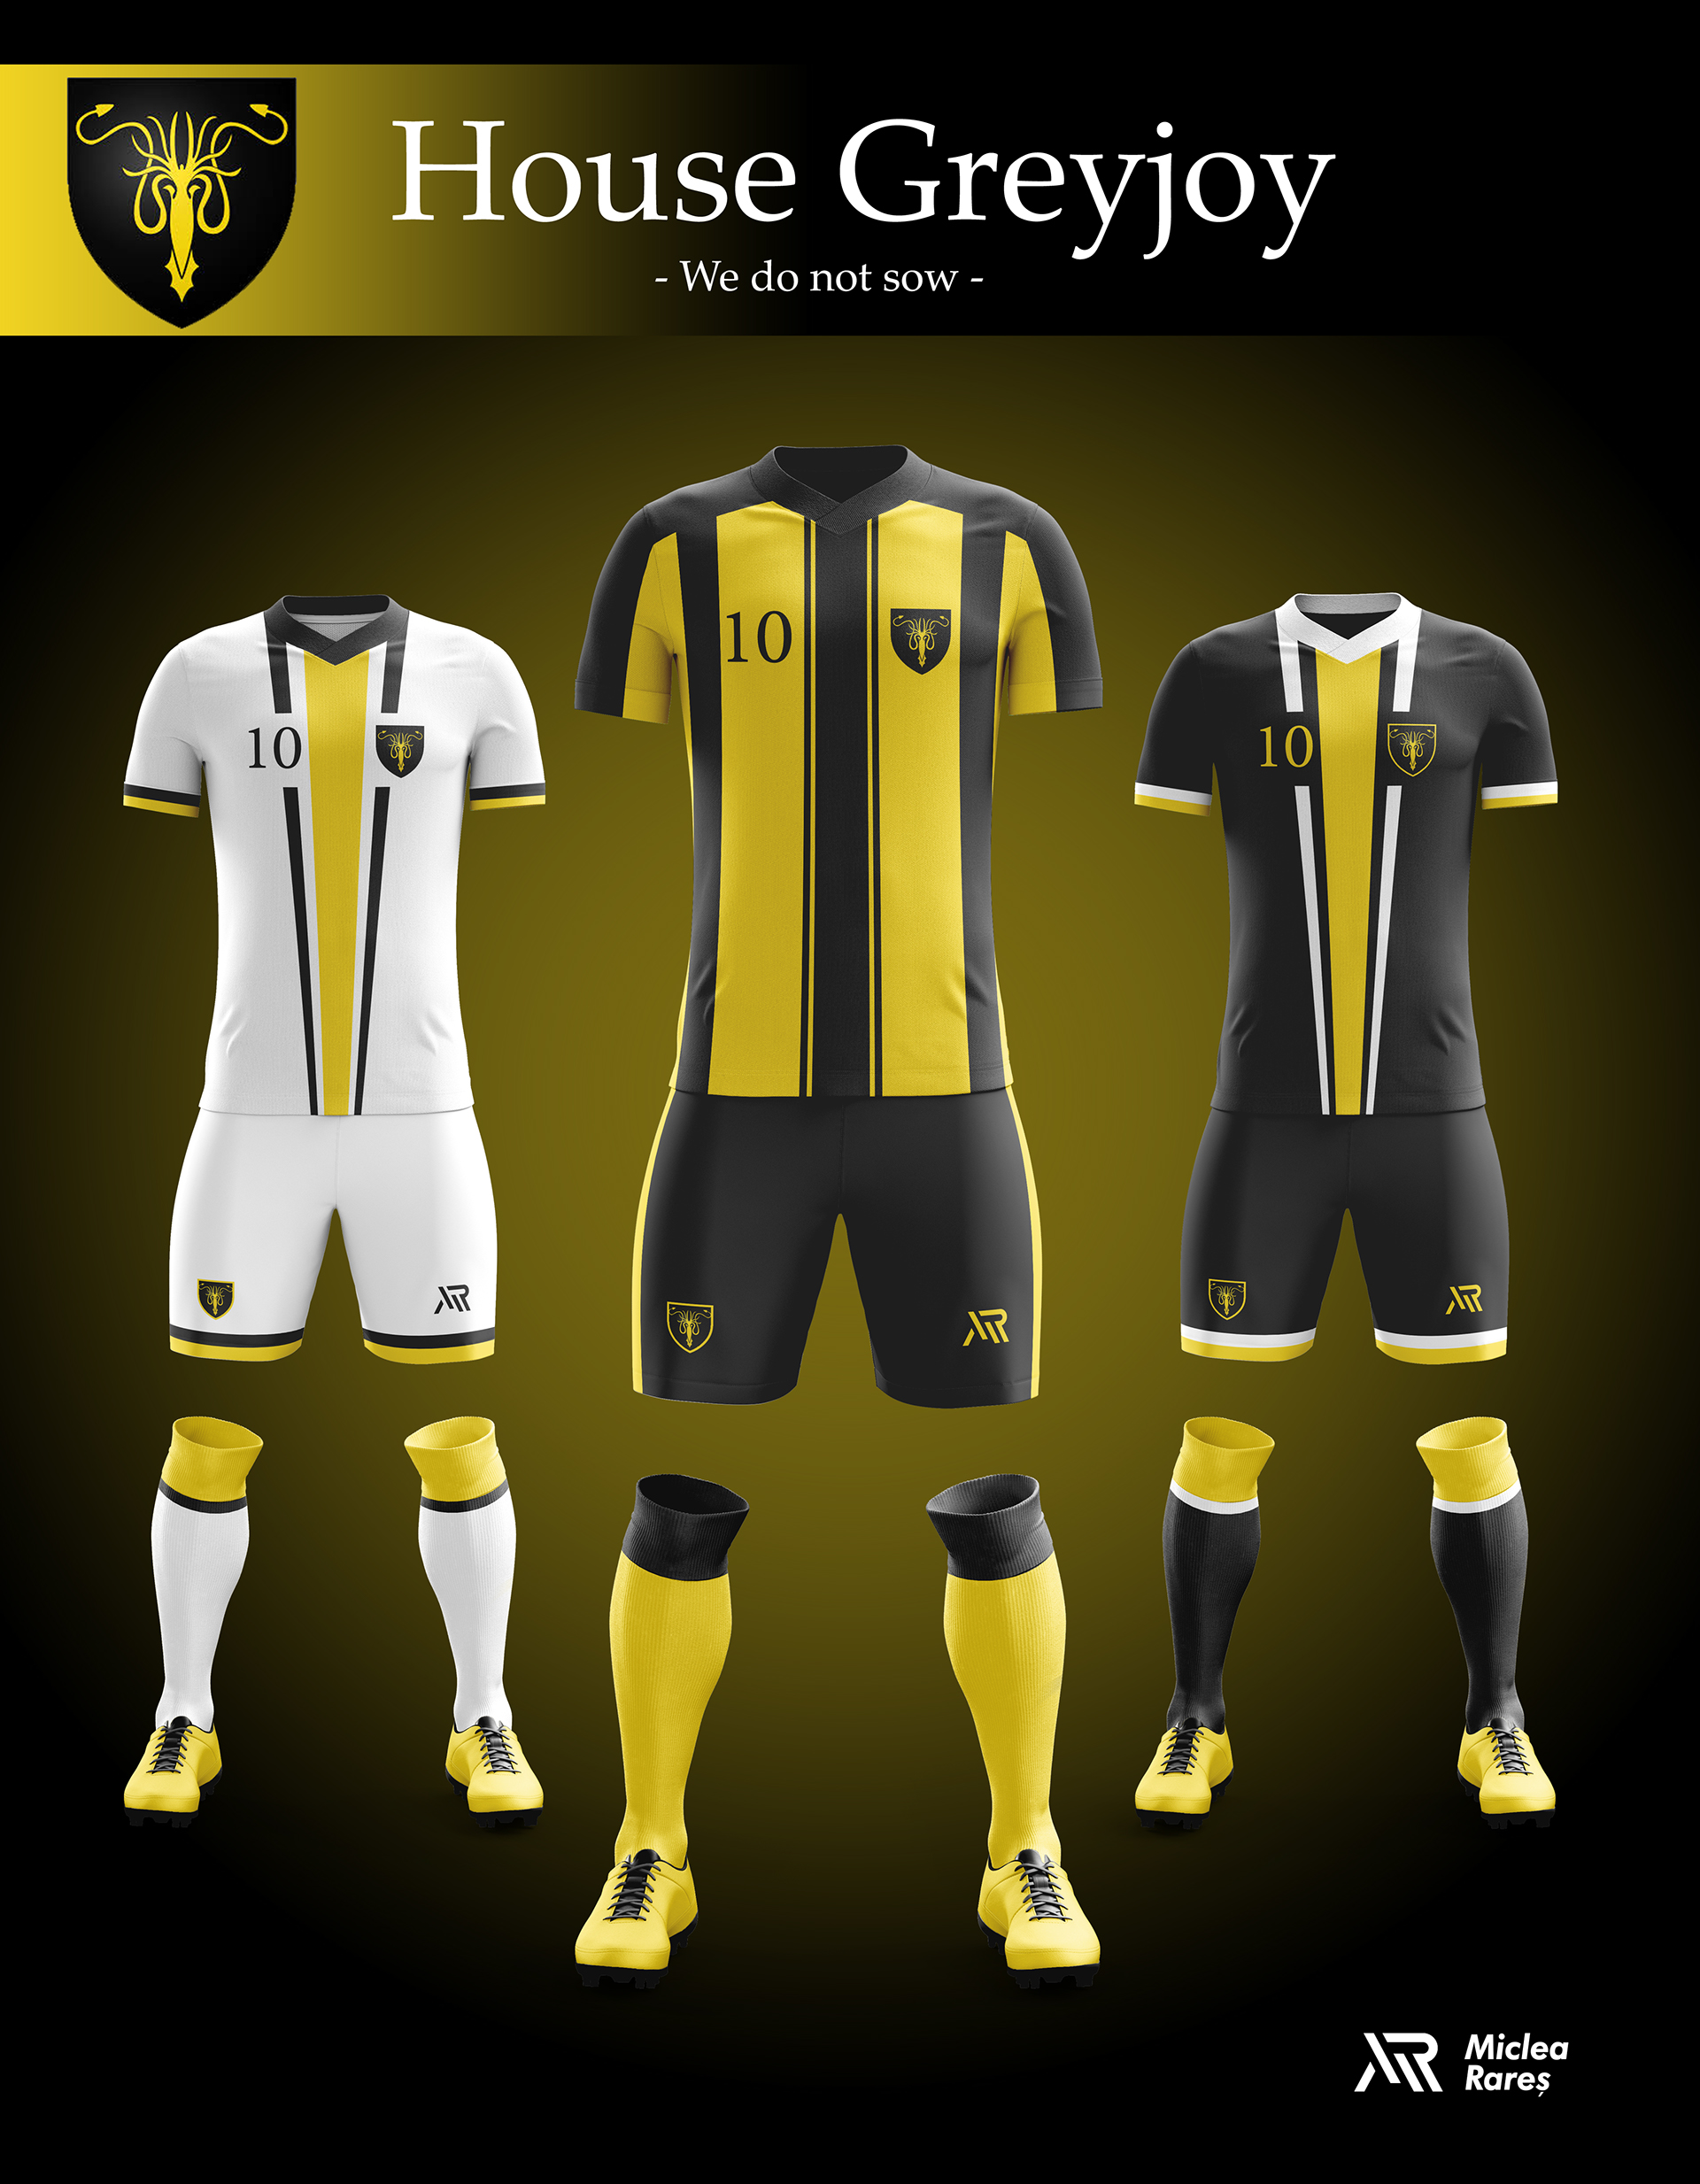 House Greyjoy Football Kit